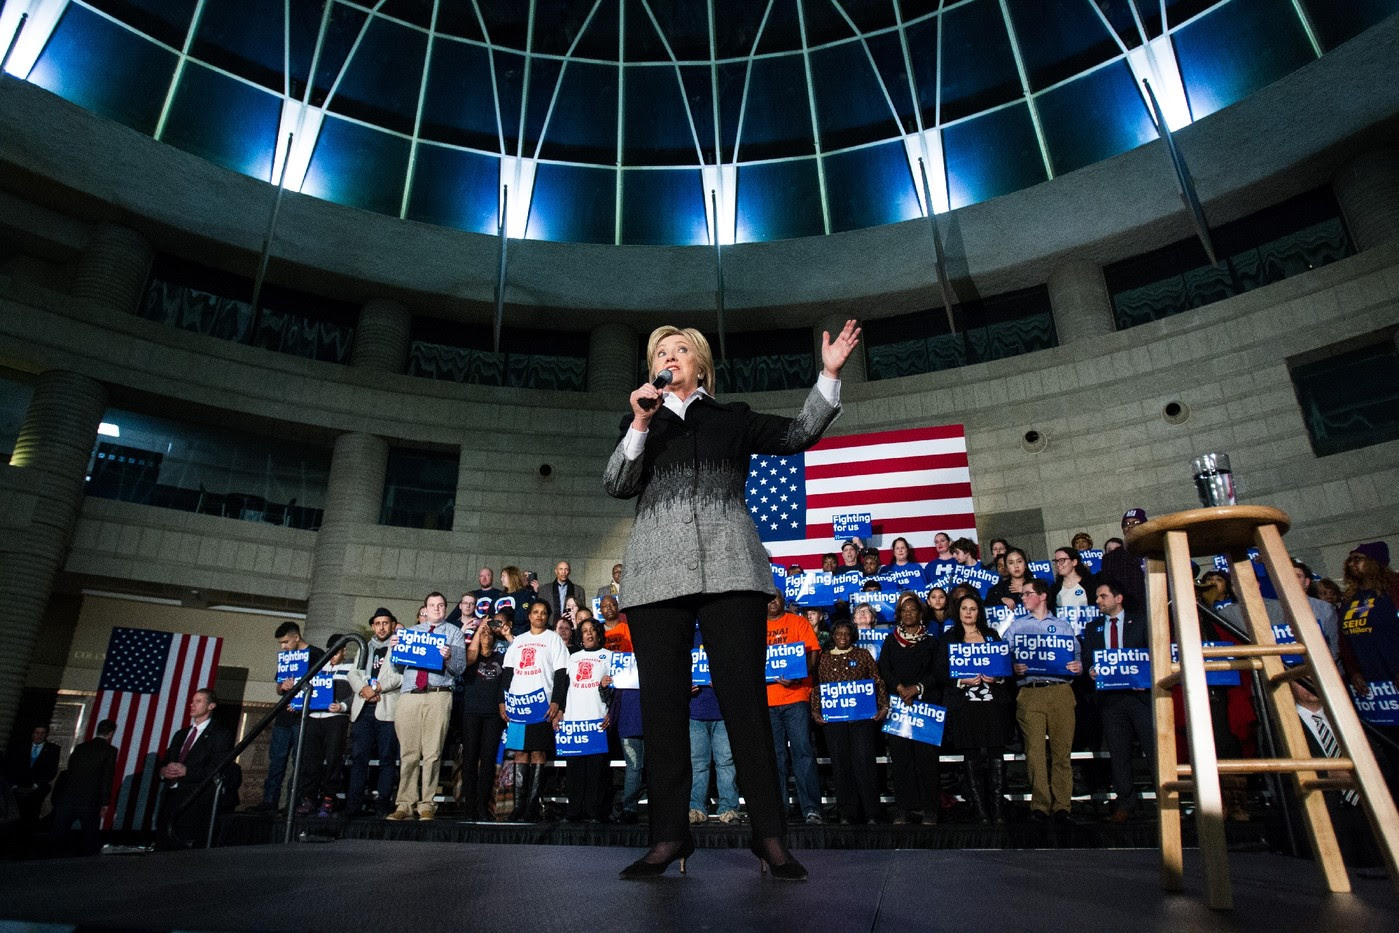 http://img.aws.la-croix.com/2016/03/09/1300745168/Hillary-Clinton-lors-reunion-electorale-Detroit-7-mars-2016_2_1400_933.jpg